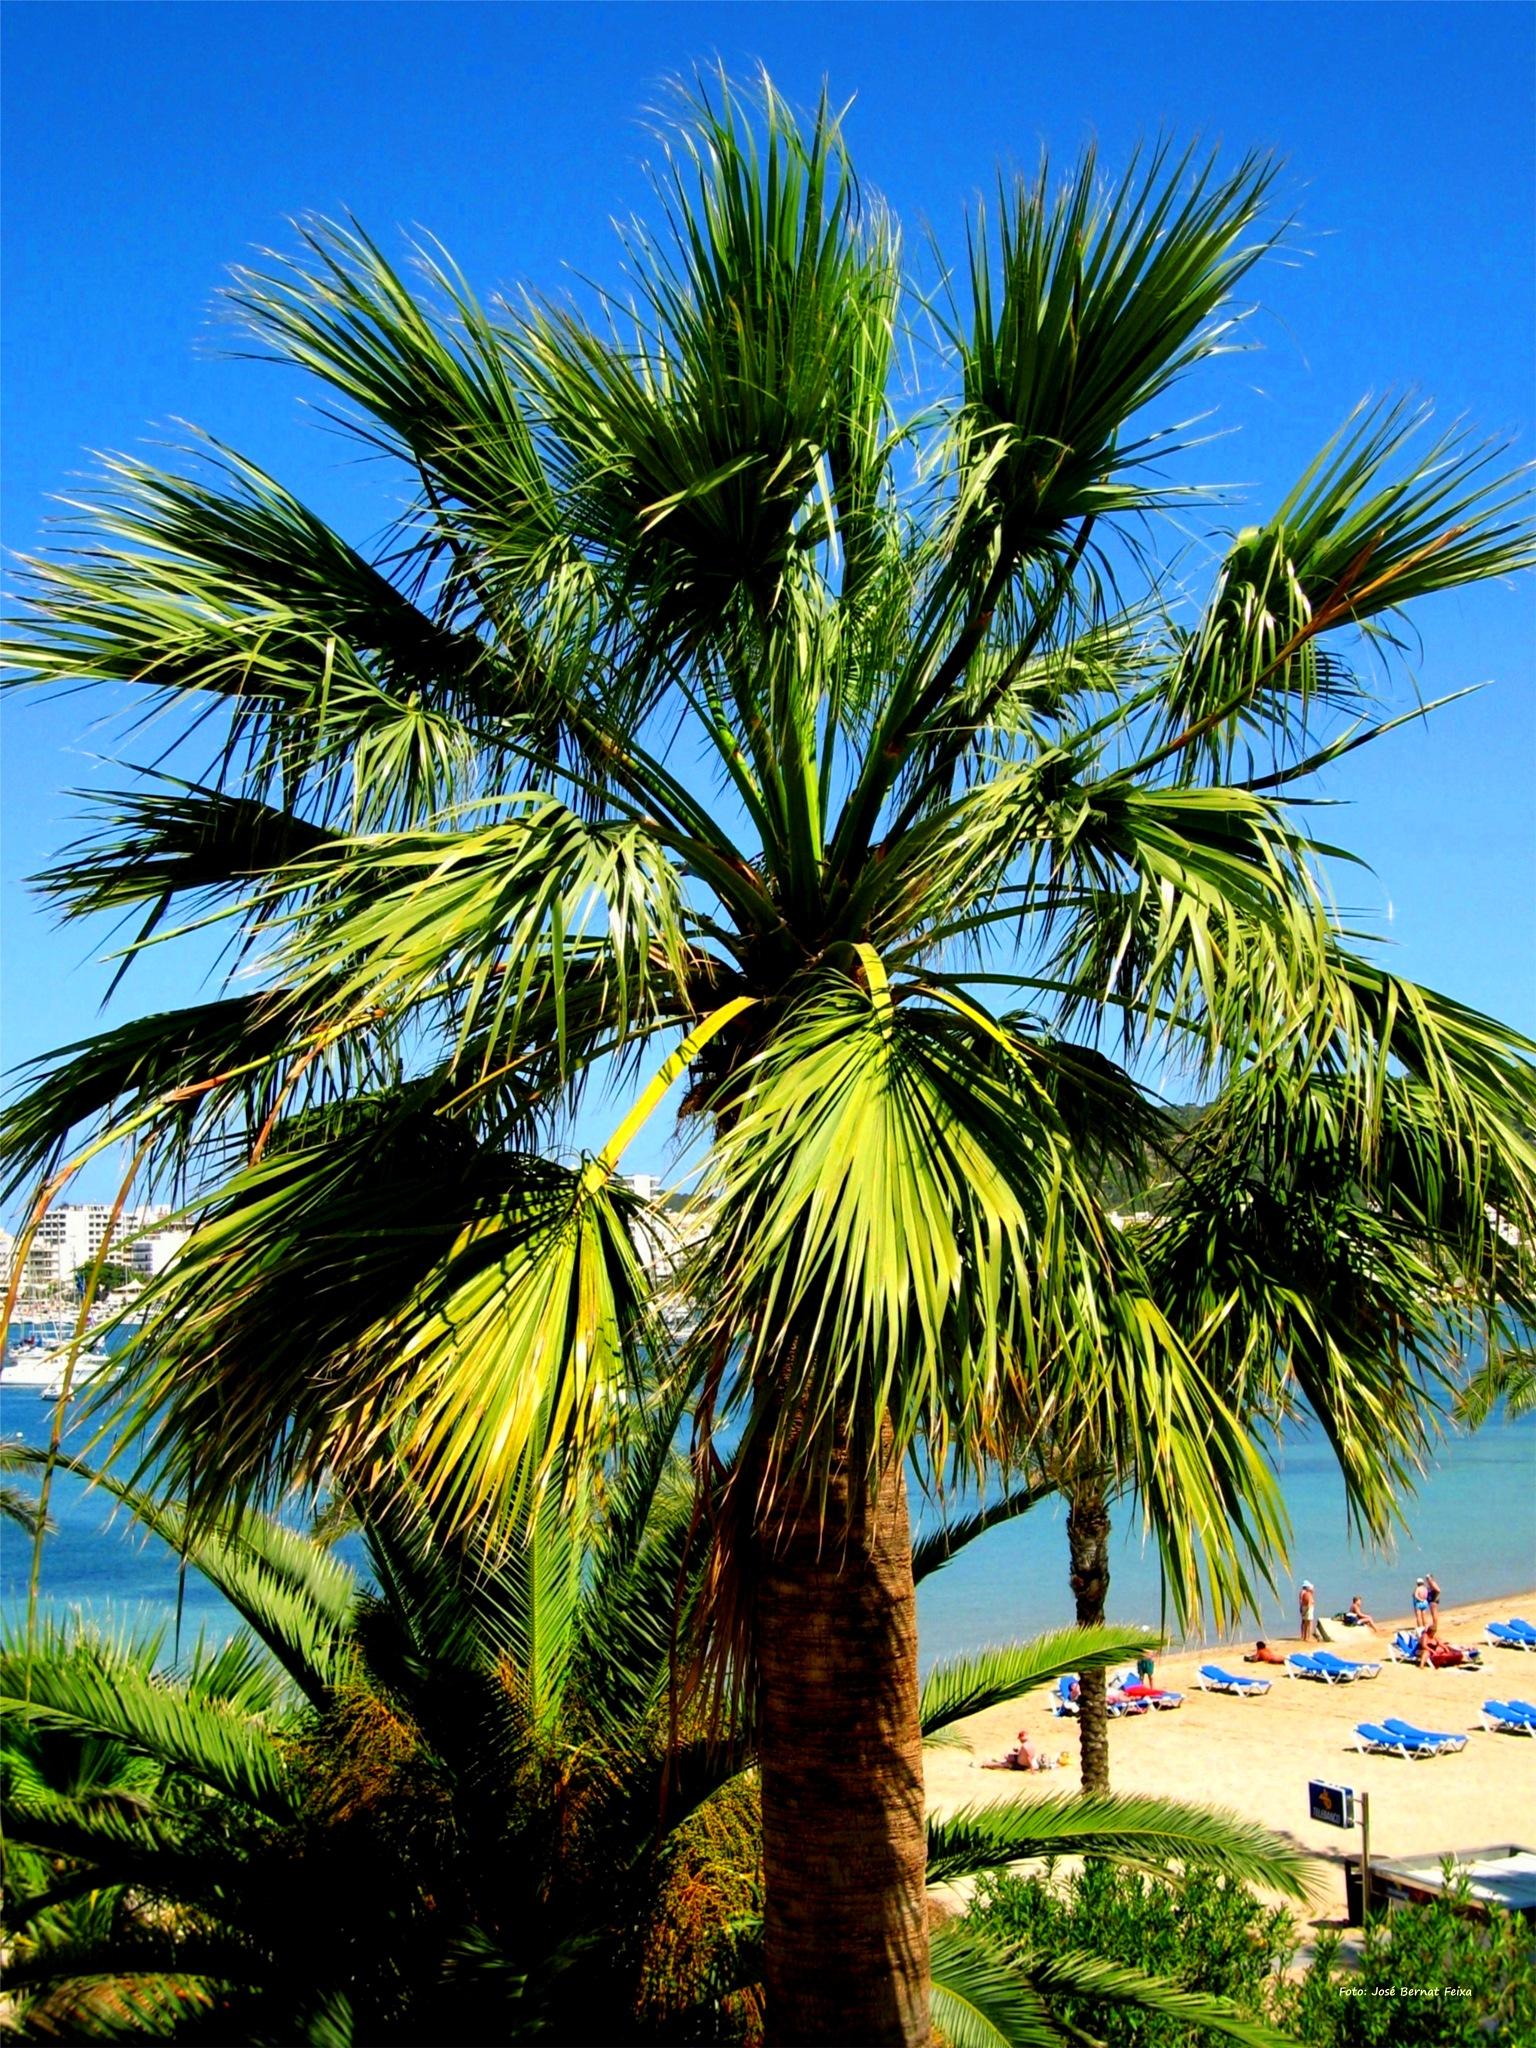 PALMERAS Y PLAYA ; PALMBOMEN EN STRAND ; PALM TREES AND BEACH by José Bernat Feixa